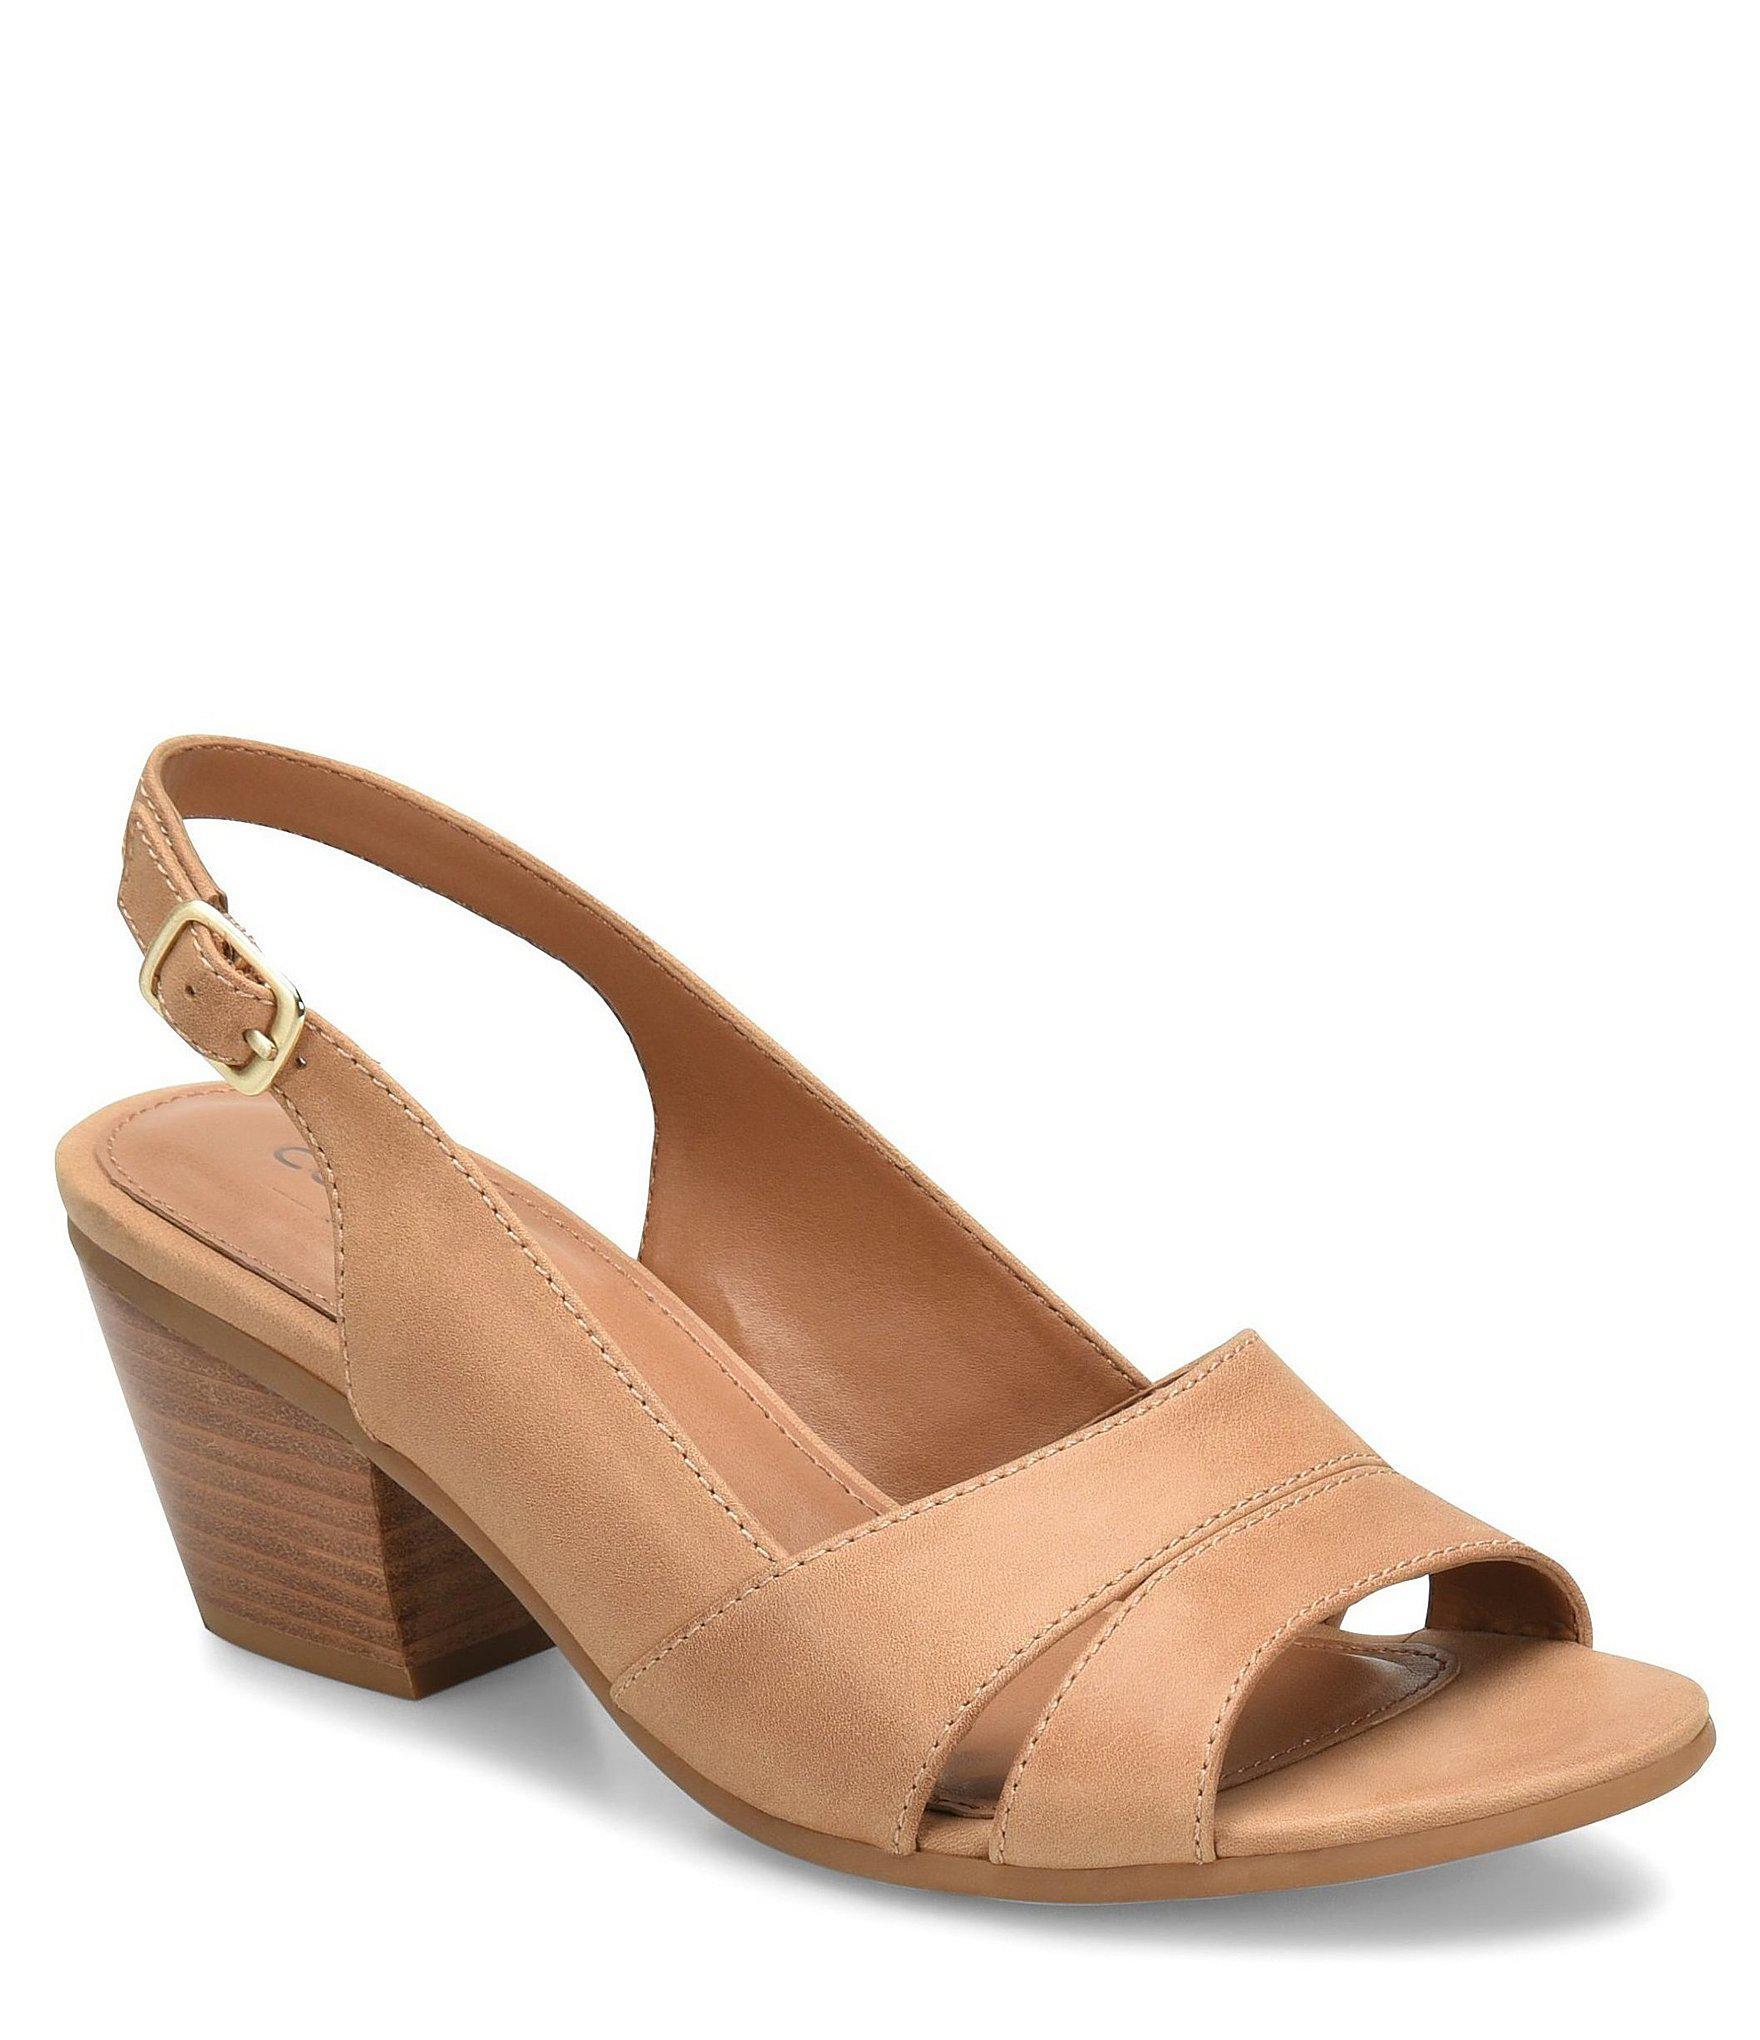 08e3f662cf8 Comfortiva. Women s Alonna Leather Block Heel Sandals